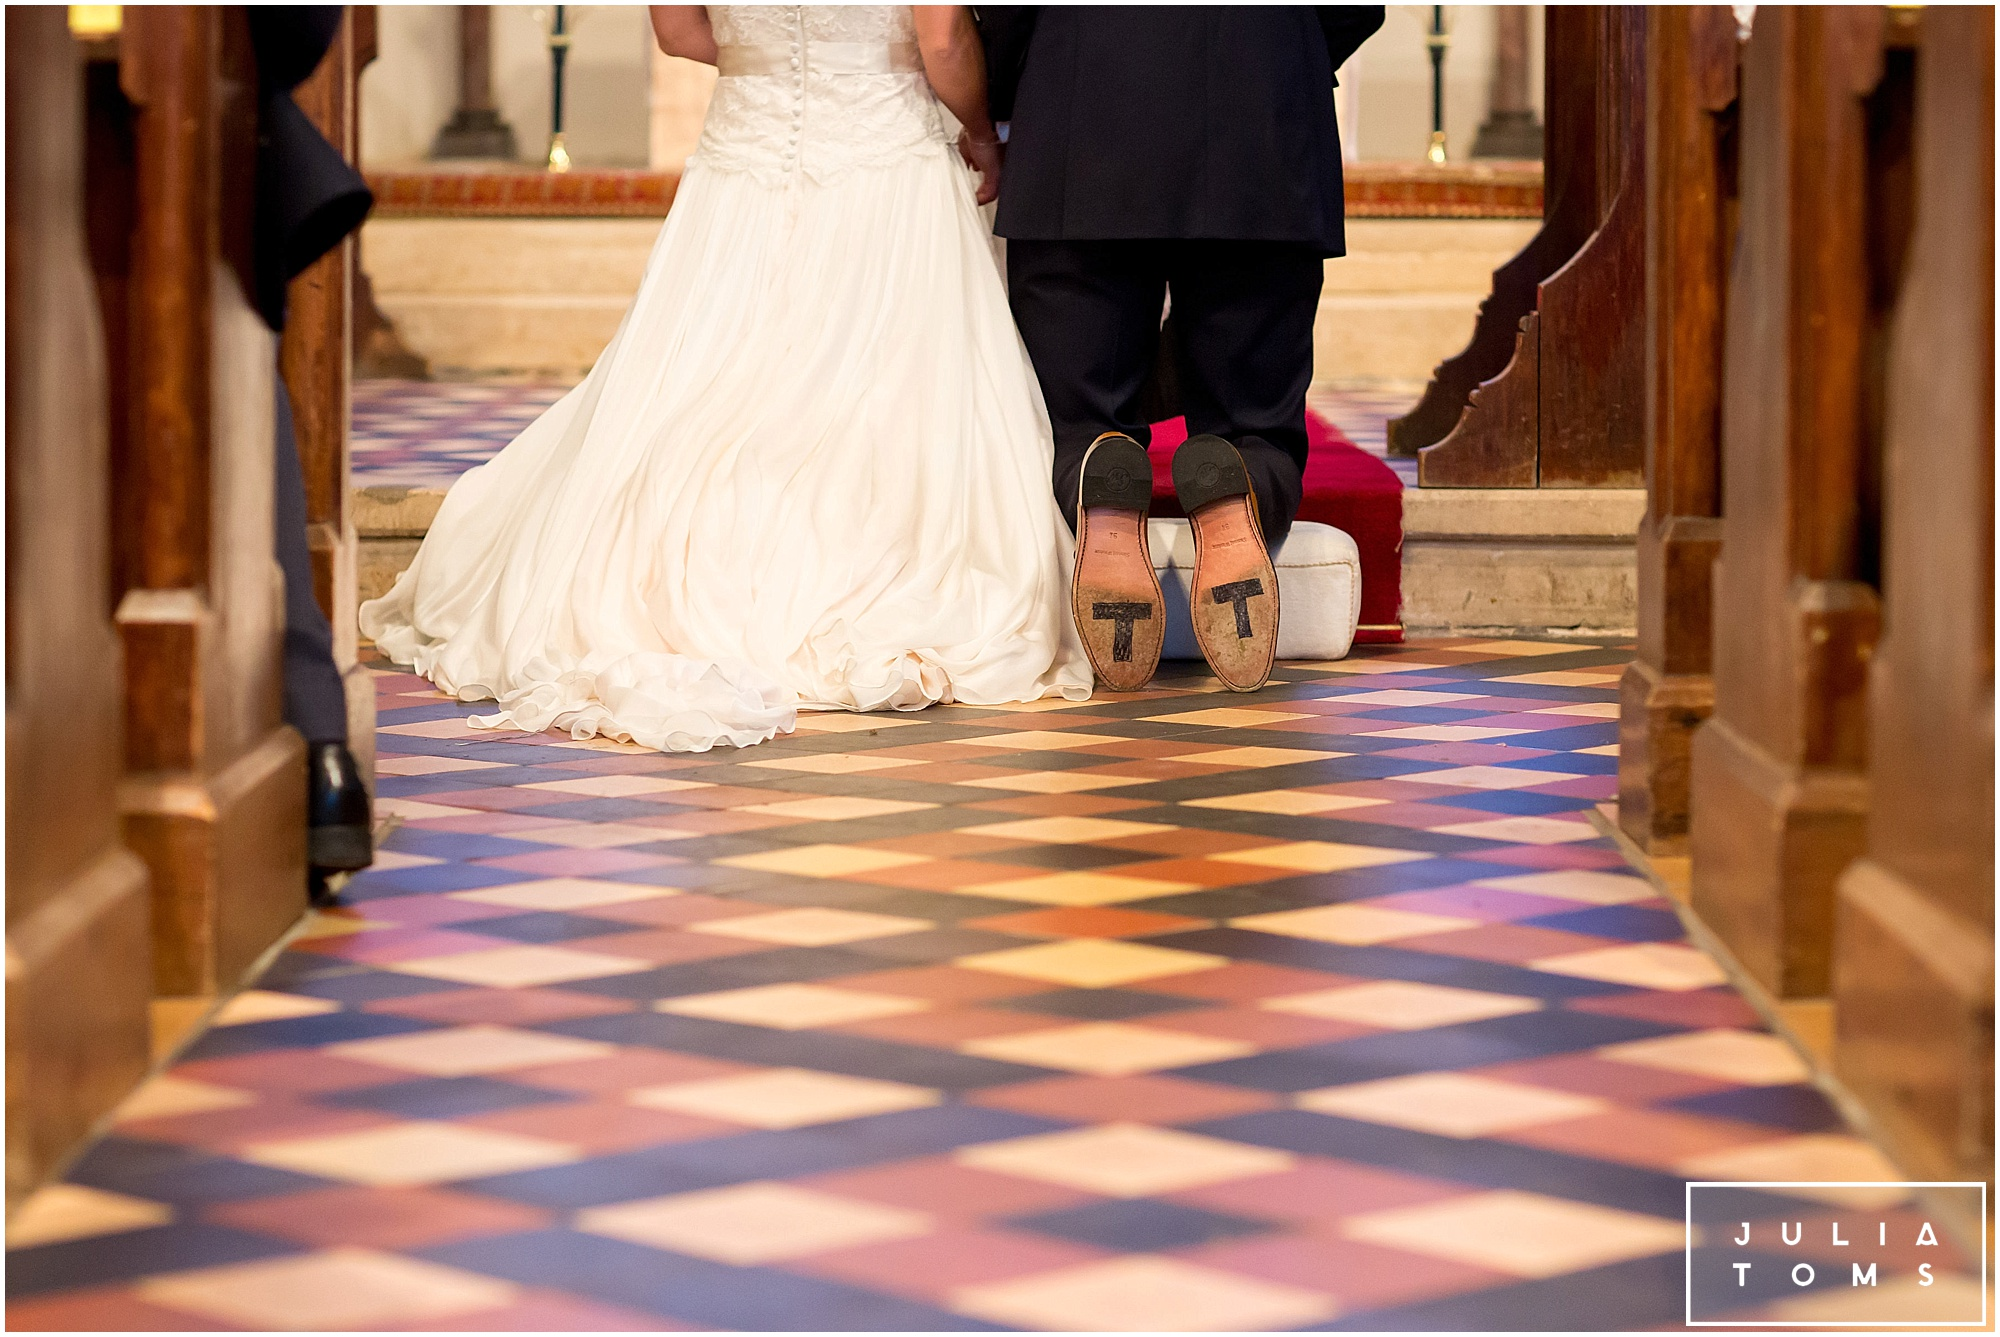 julia_toms_chichester_wedding_photographer_portsmouth_027.jpg